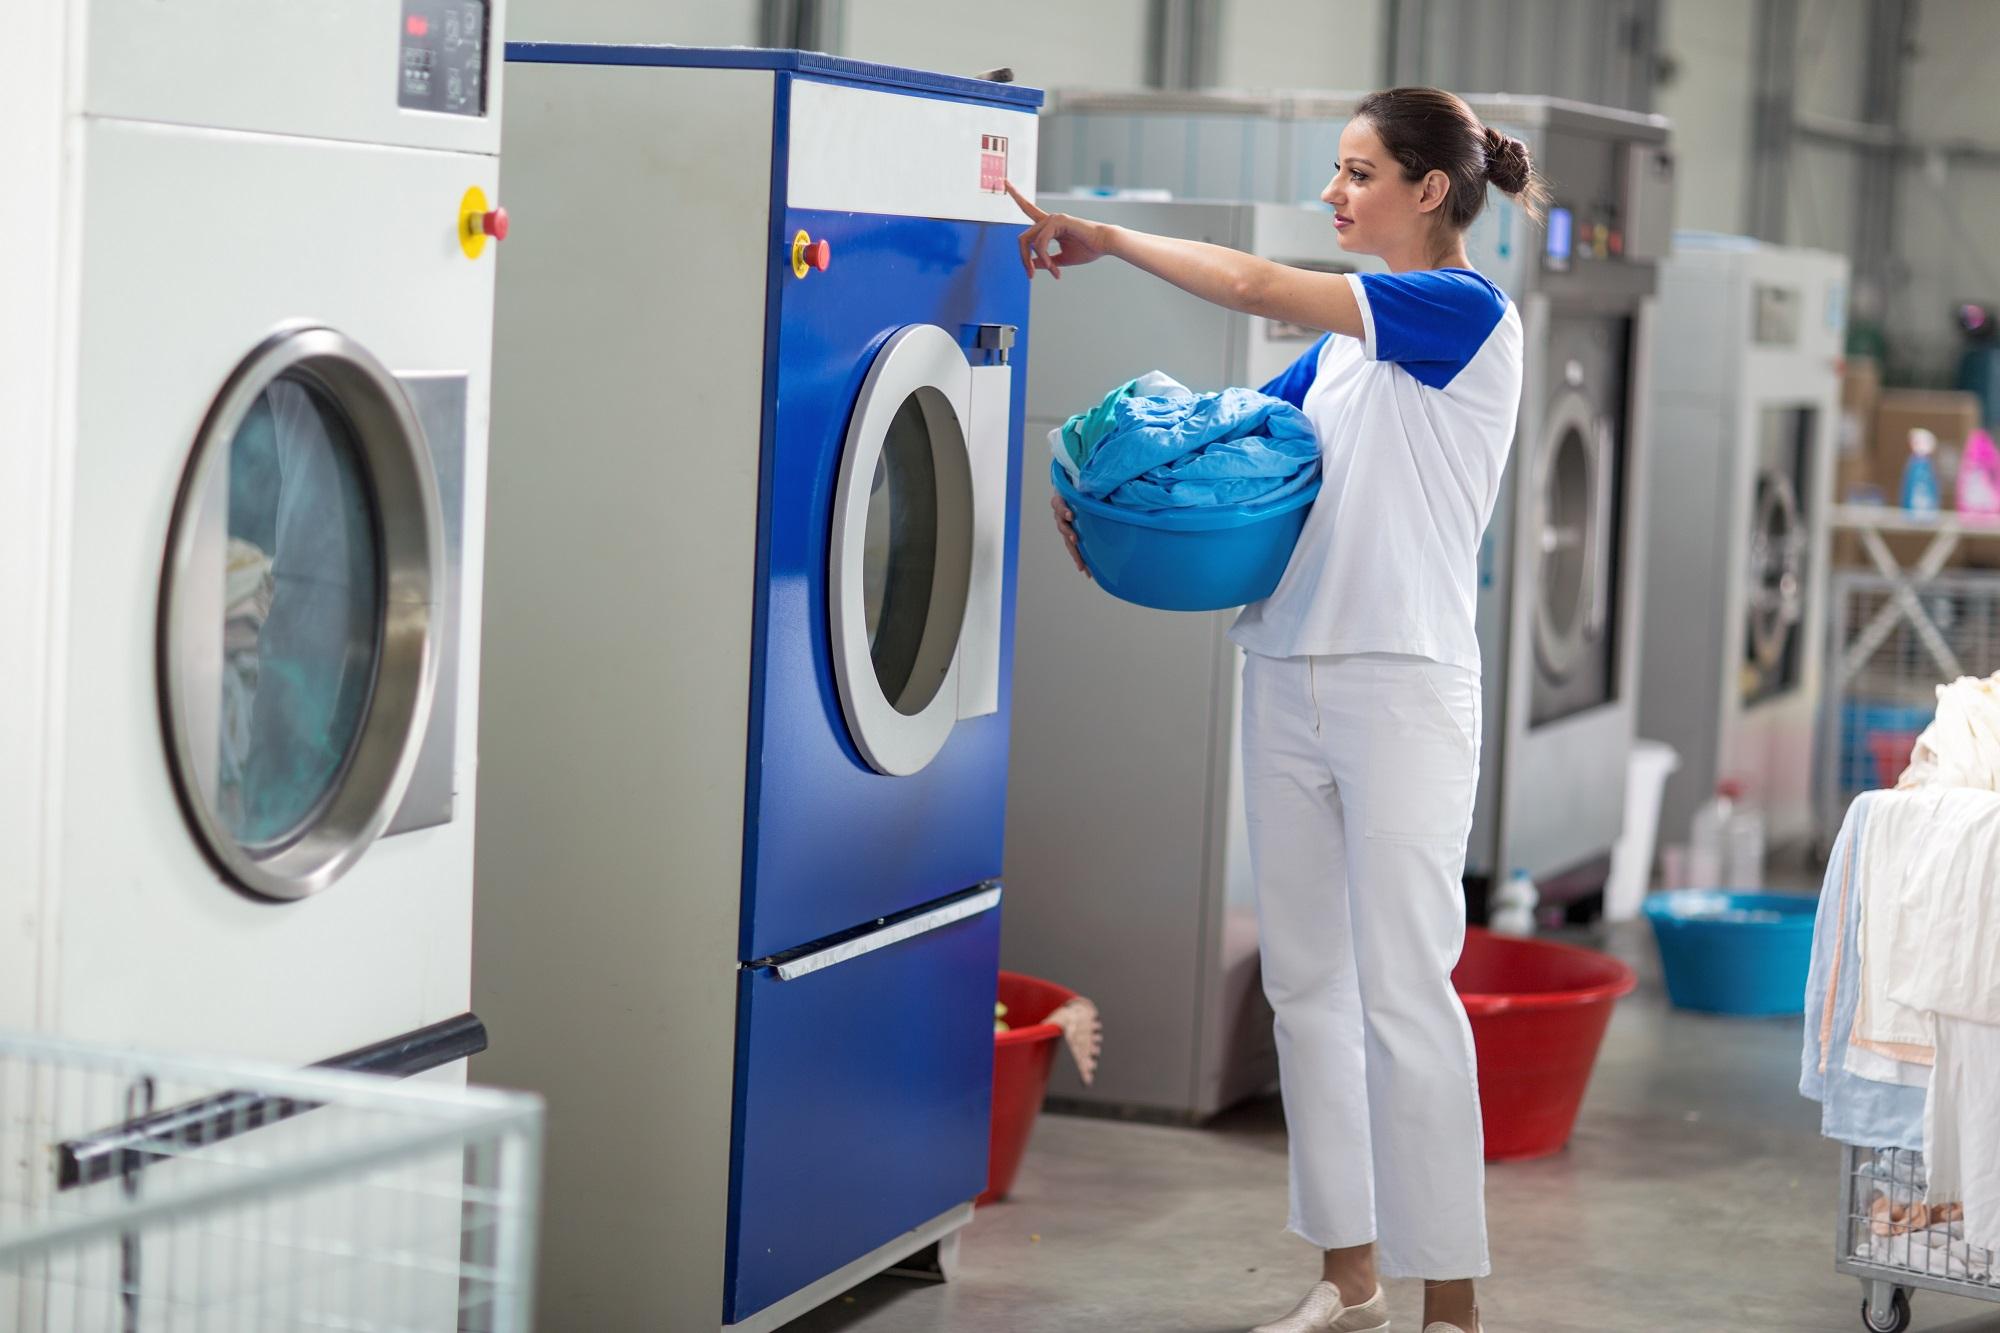 Employees including washing machines